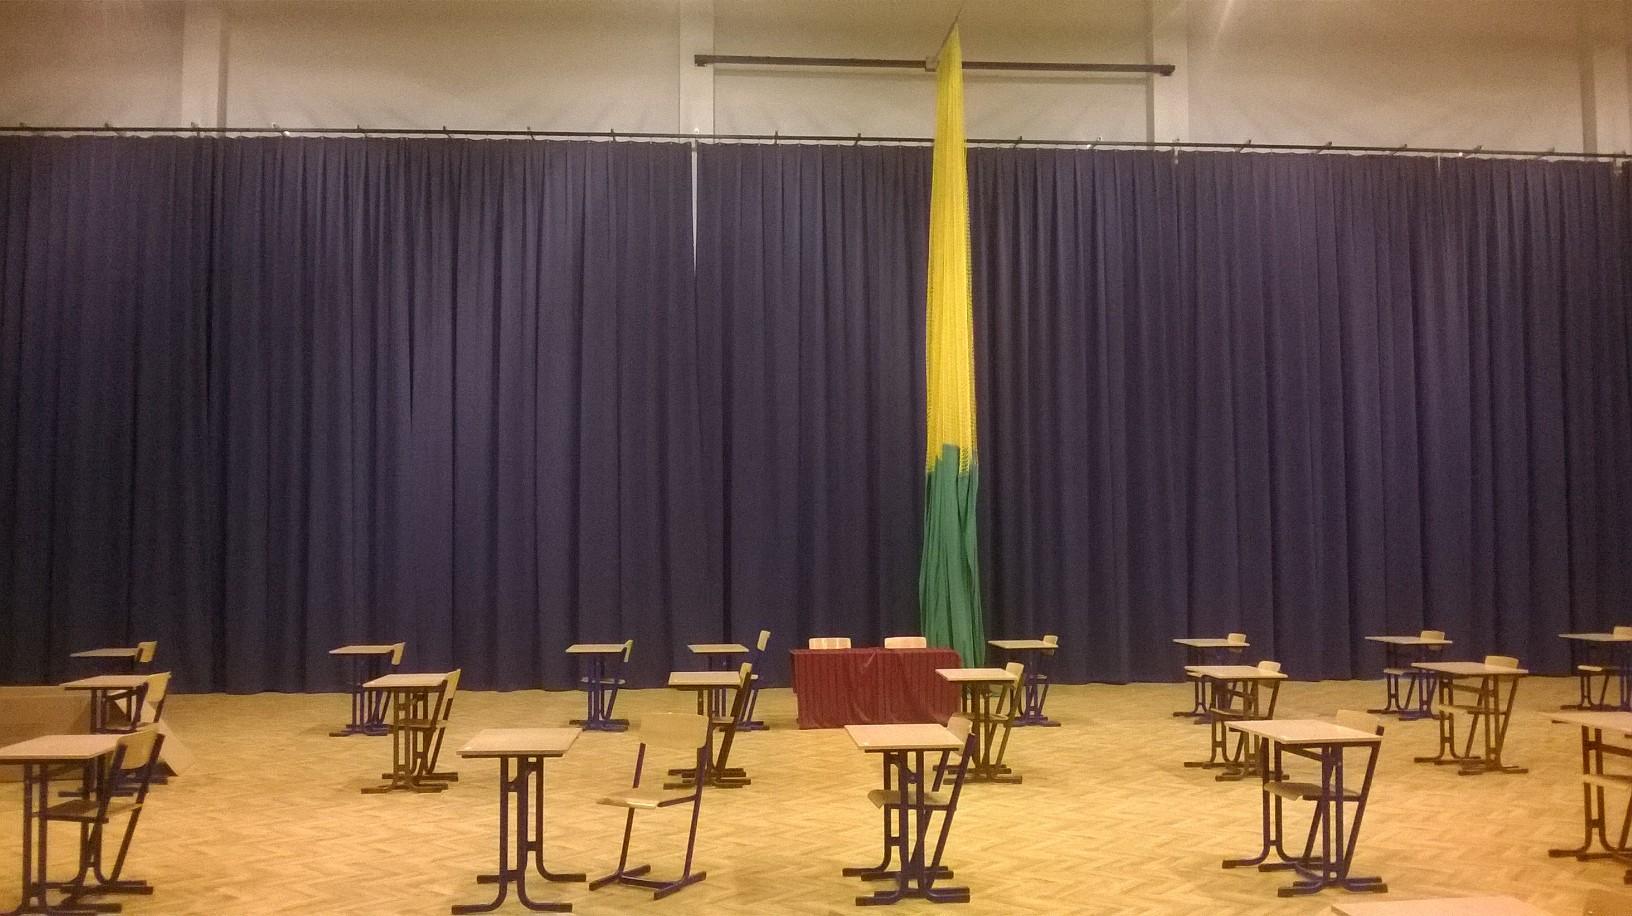 Sportovní gymnázium Karniewo v Polsku